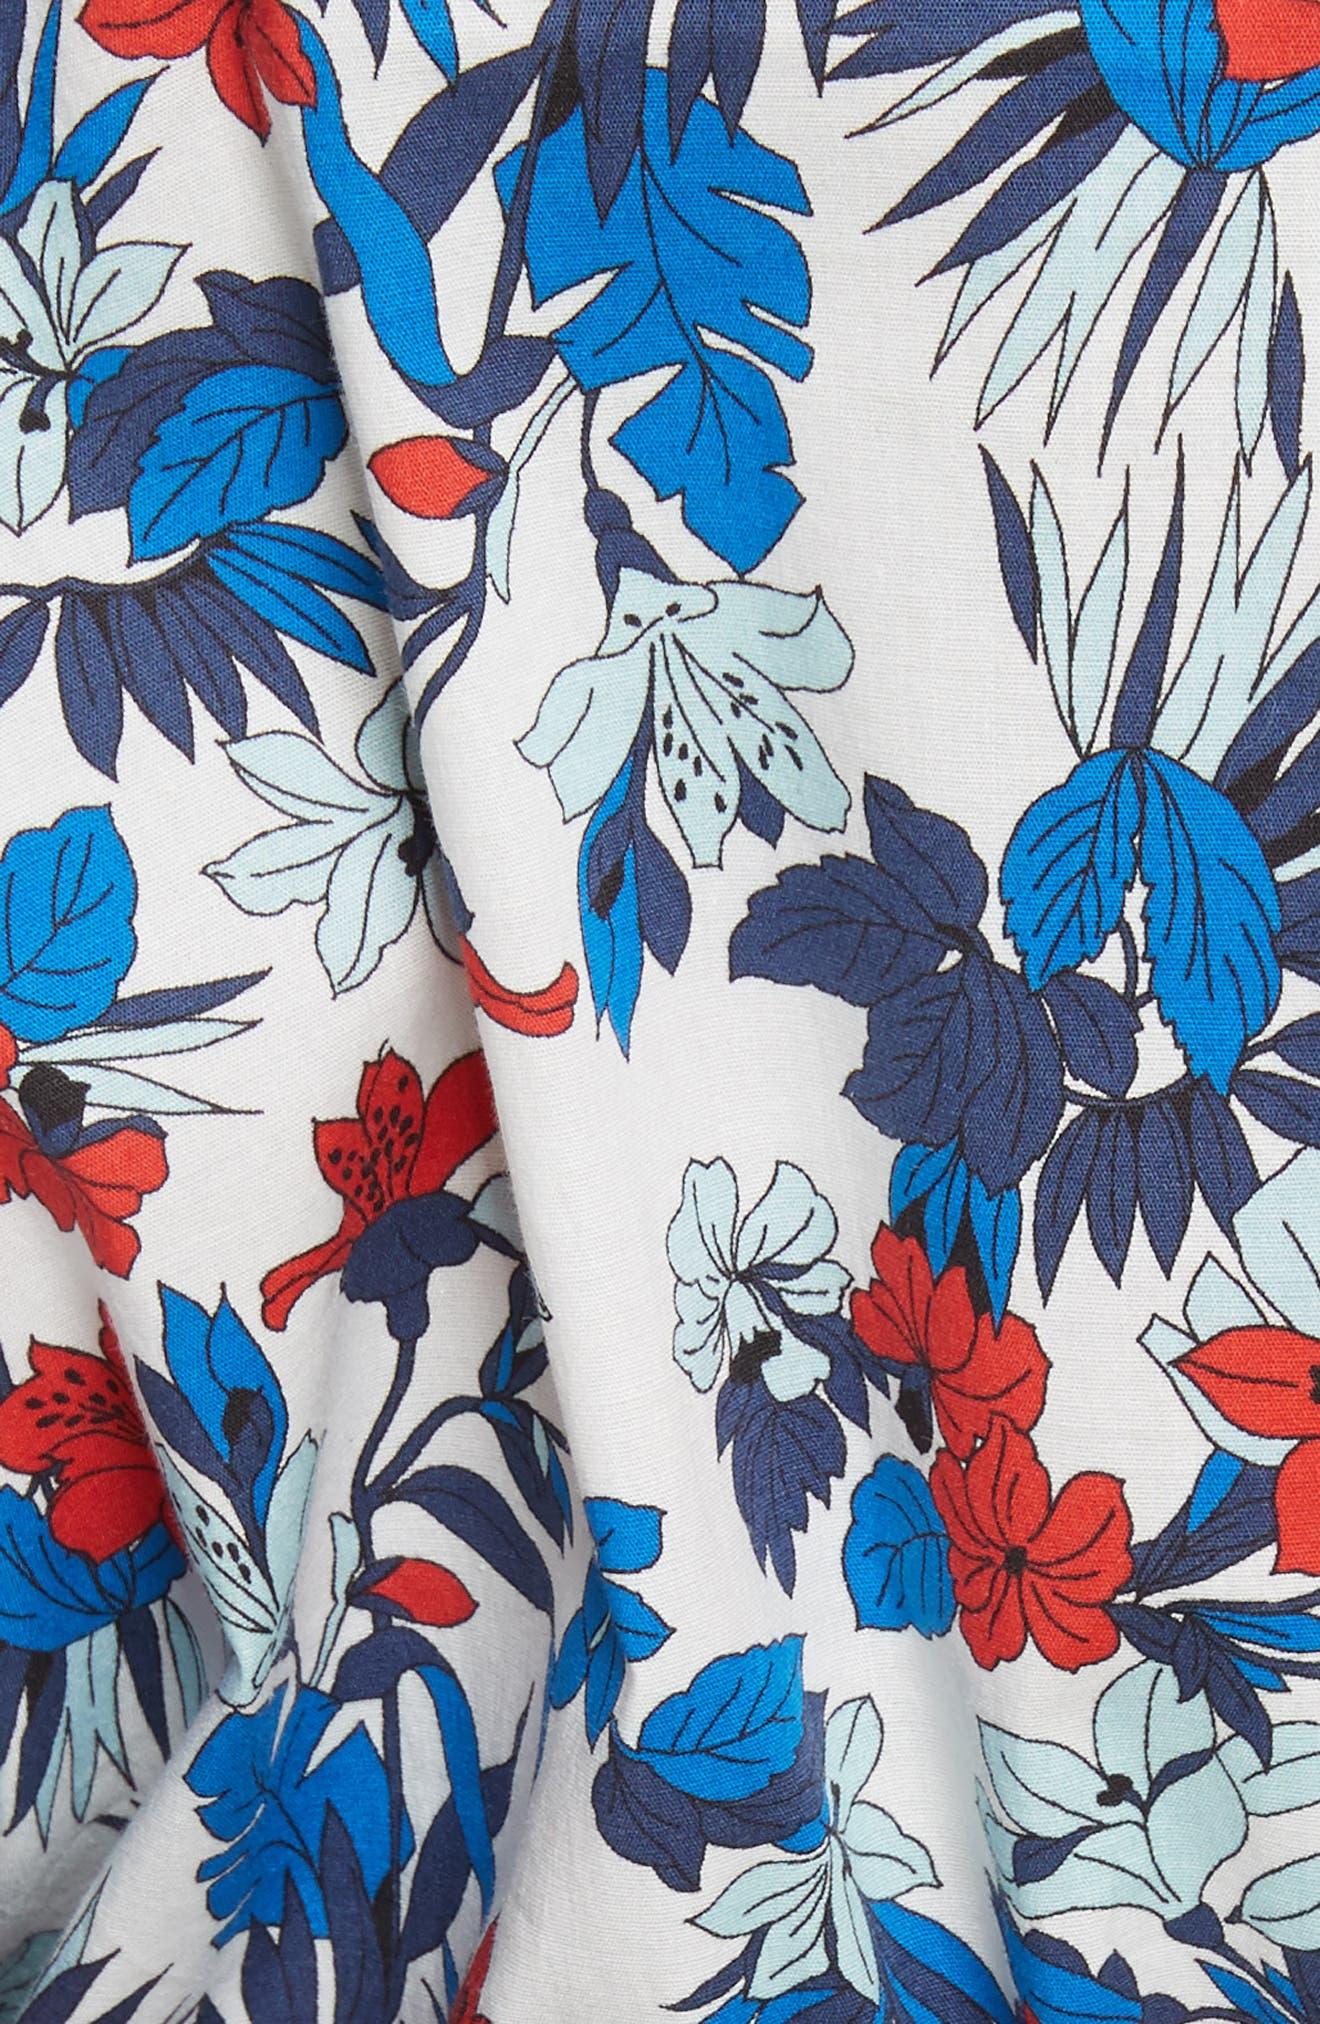 Hibiscus Print Stretch Cotton Top,                             Alternate thumbnail 5, color,                             433